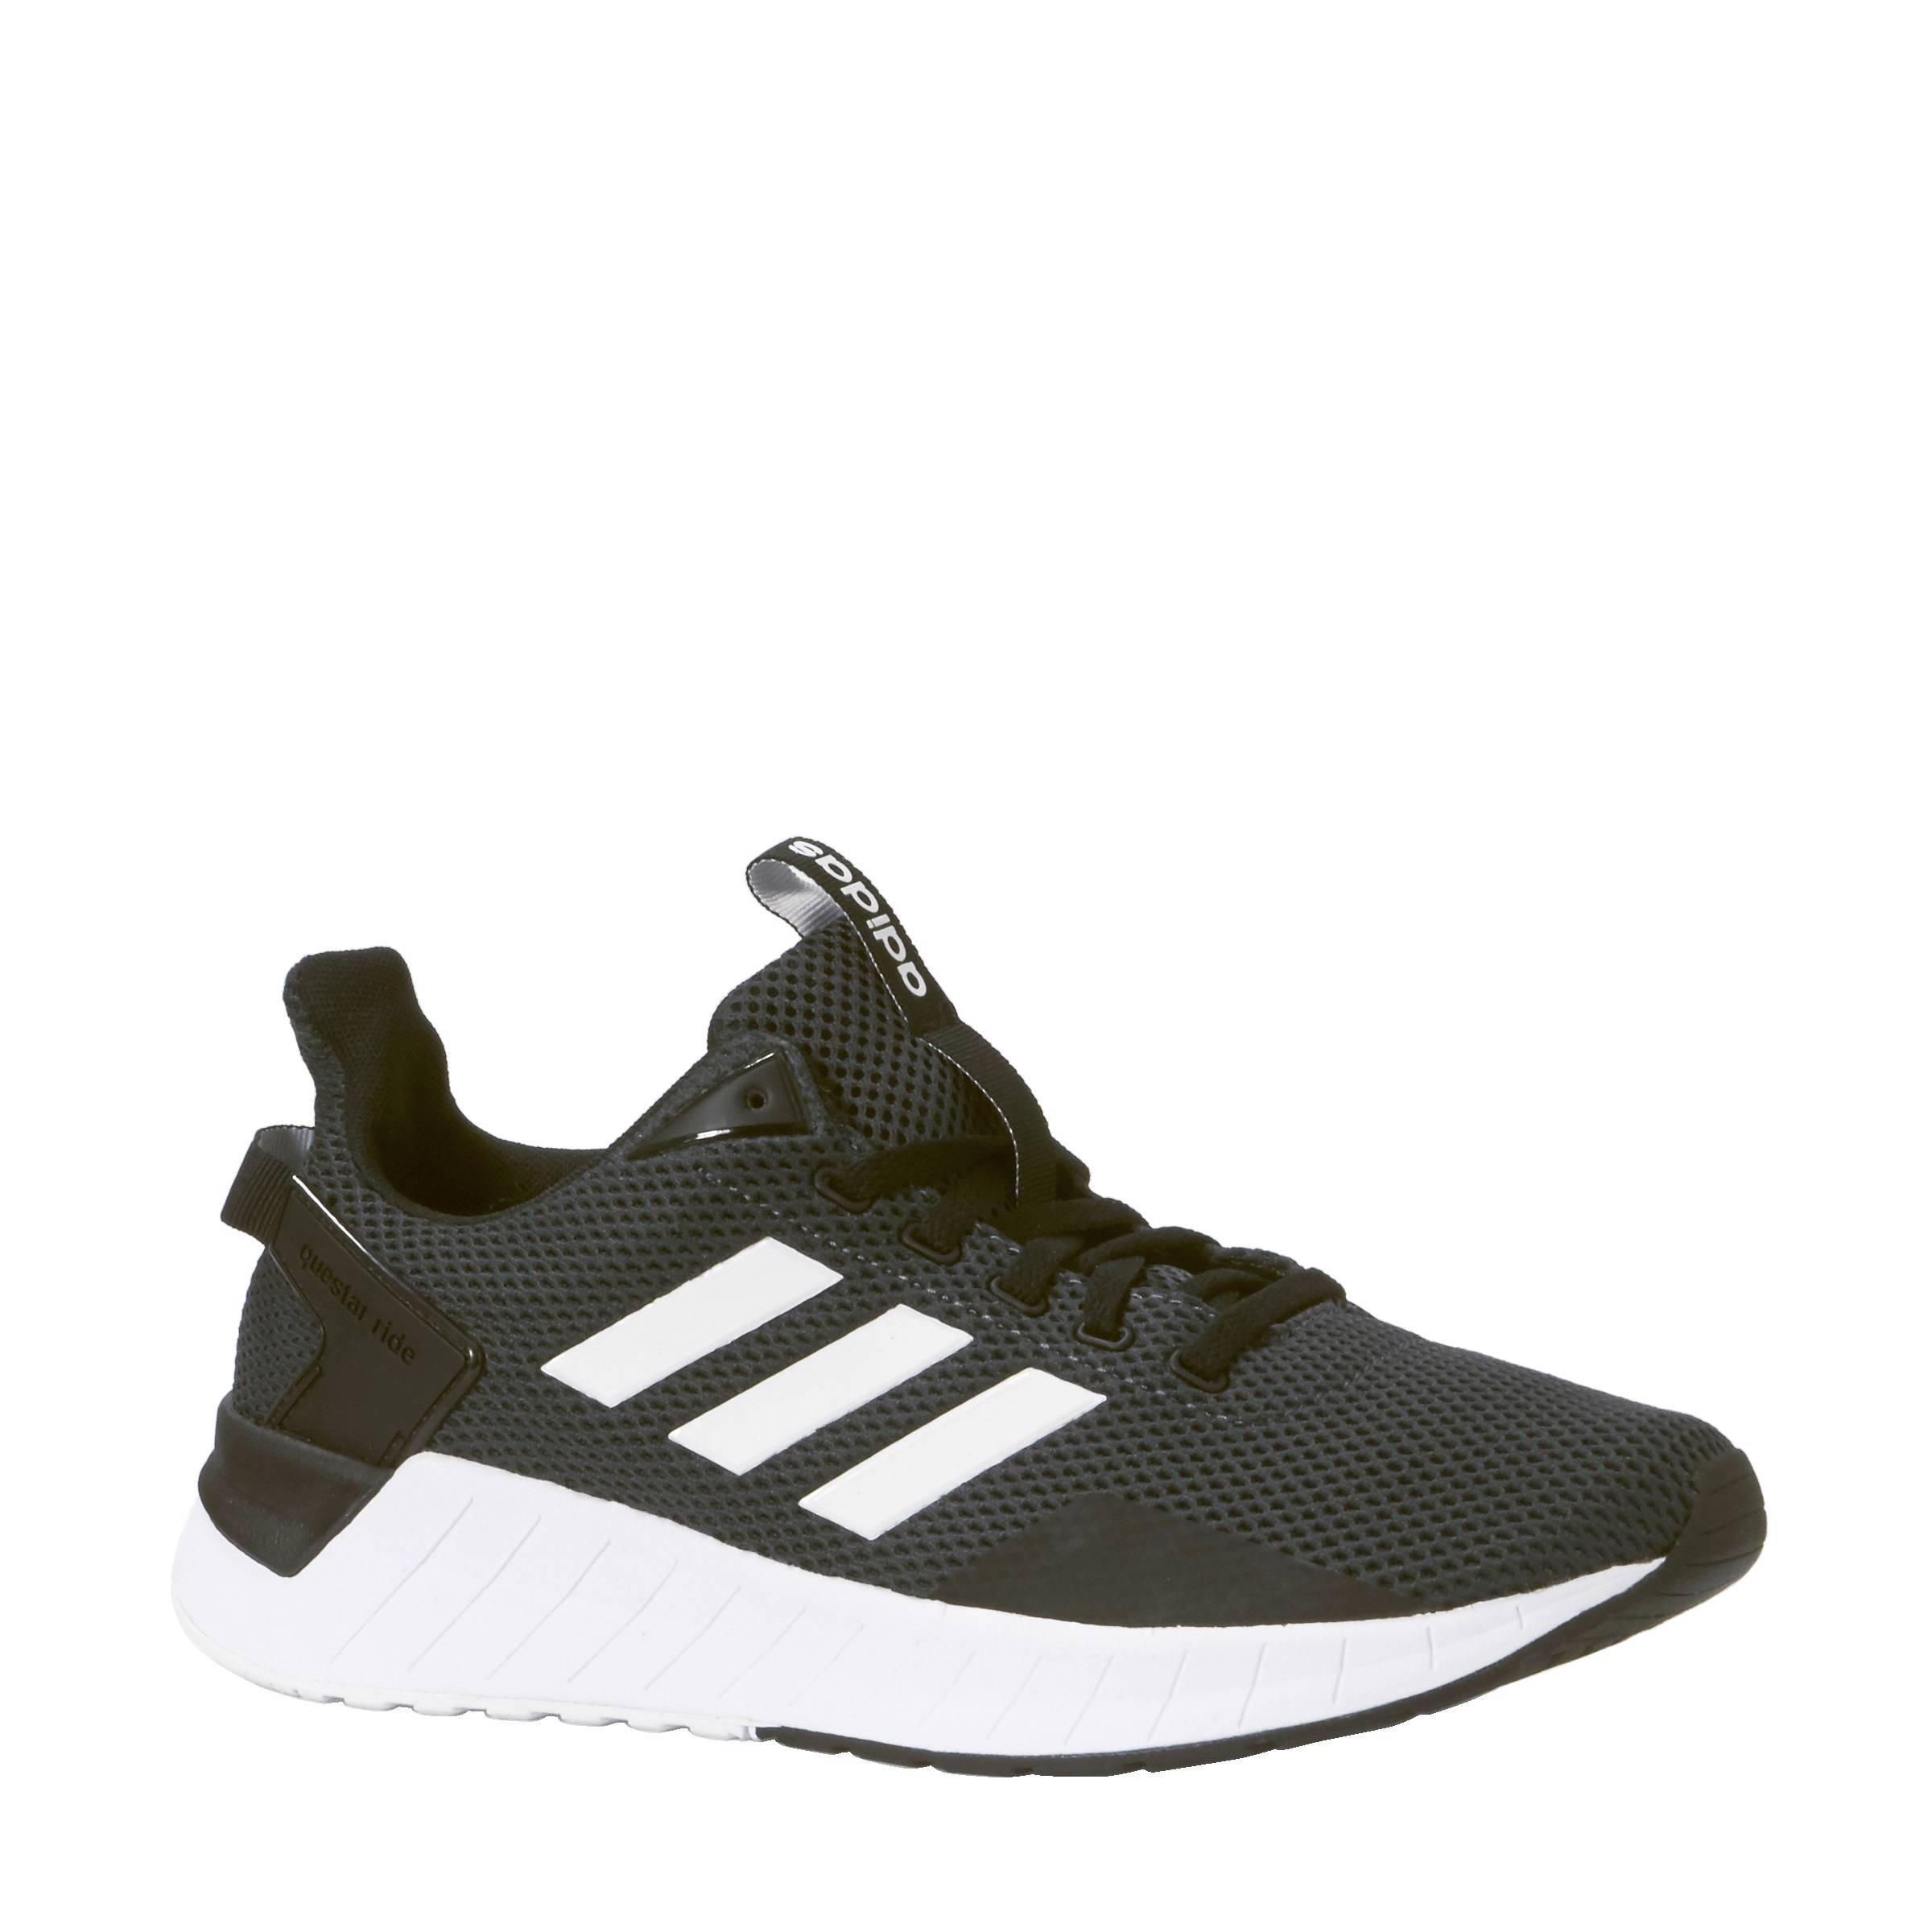 ff6bb9c2cbe adidas-performance-questar-ride-hardloopschoenen-heren-zwart-4059323760647.jpg